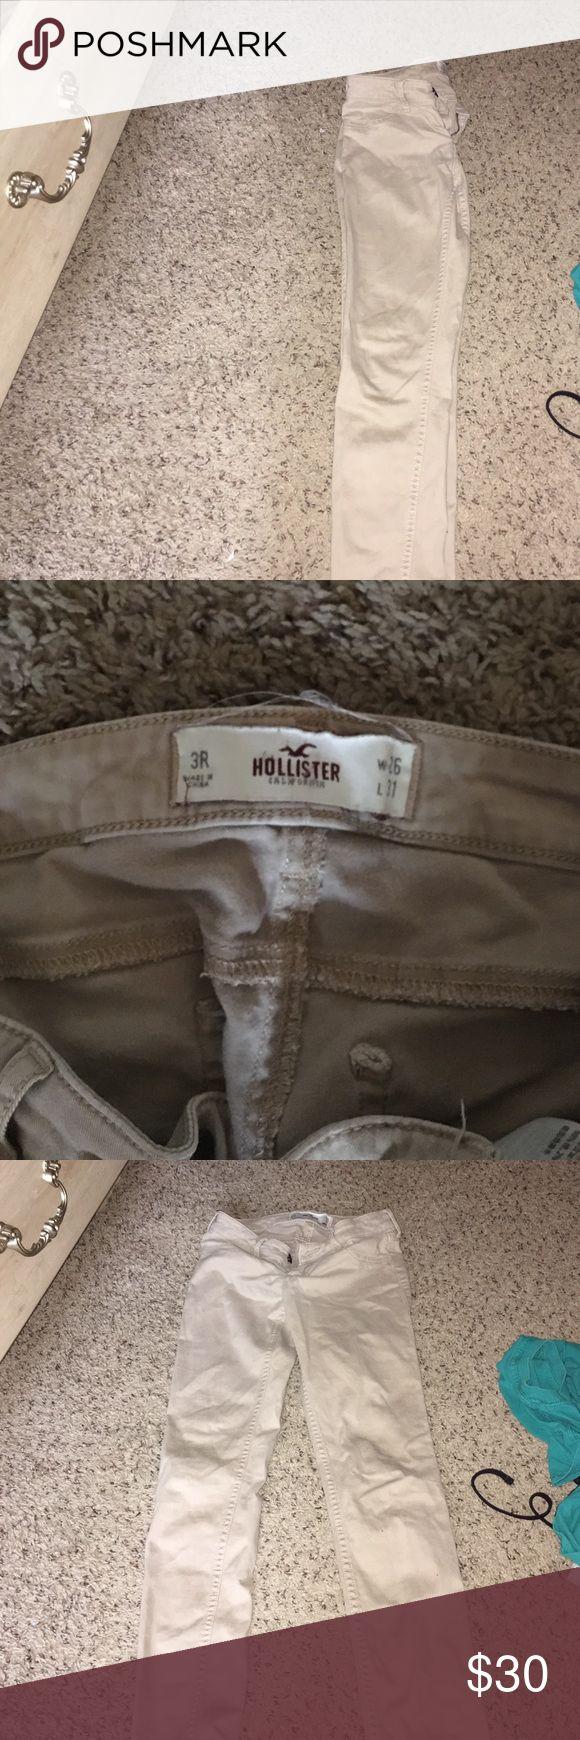 Khaki pants /jeans Skinny khaki pants ,  nice and plain  great fit for juniors Hollister Jeans Skinny